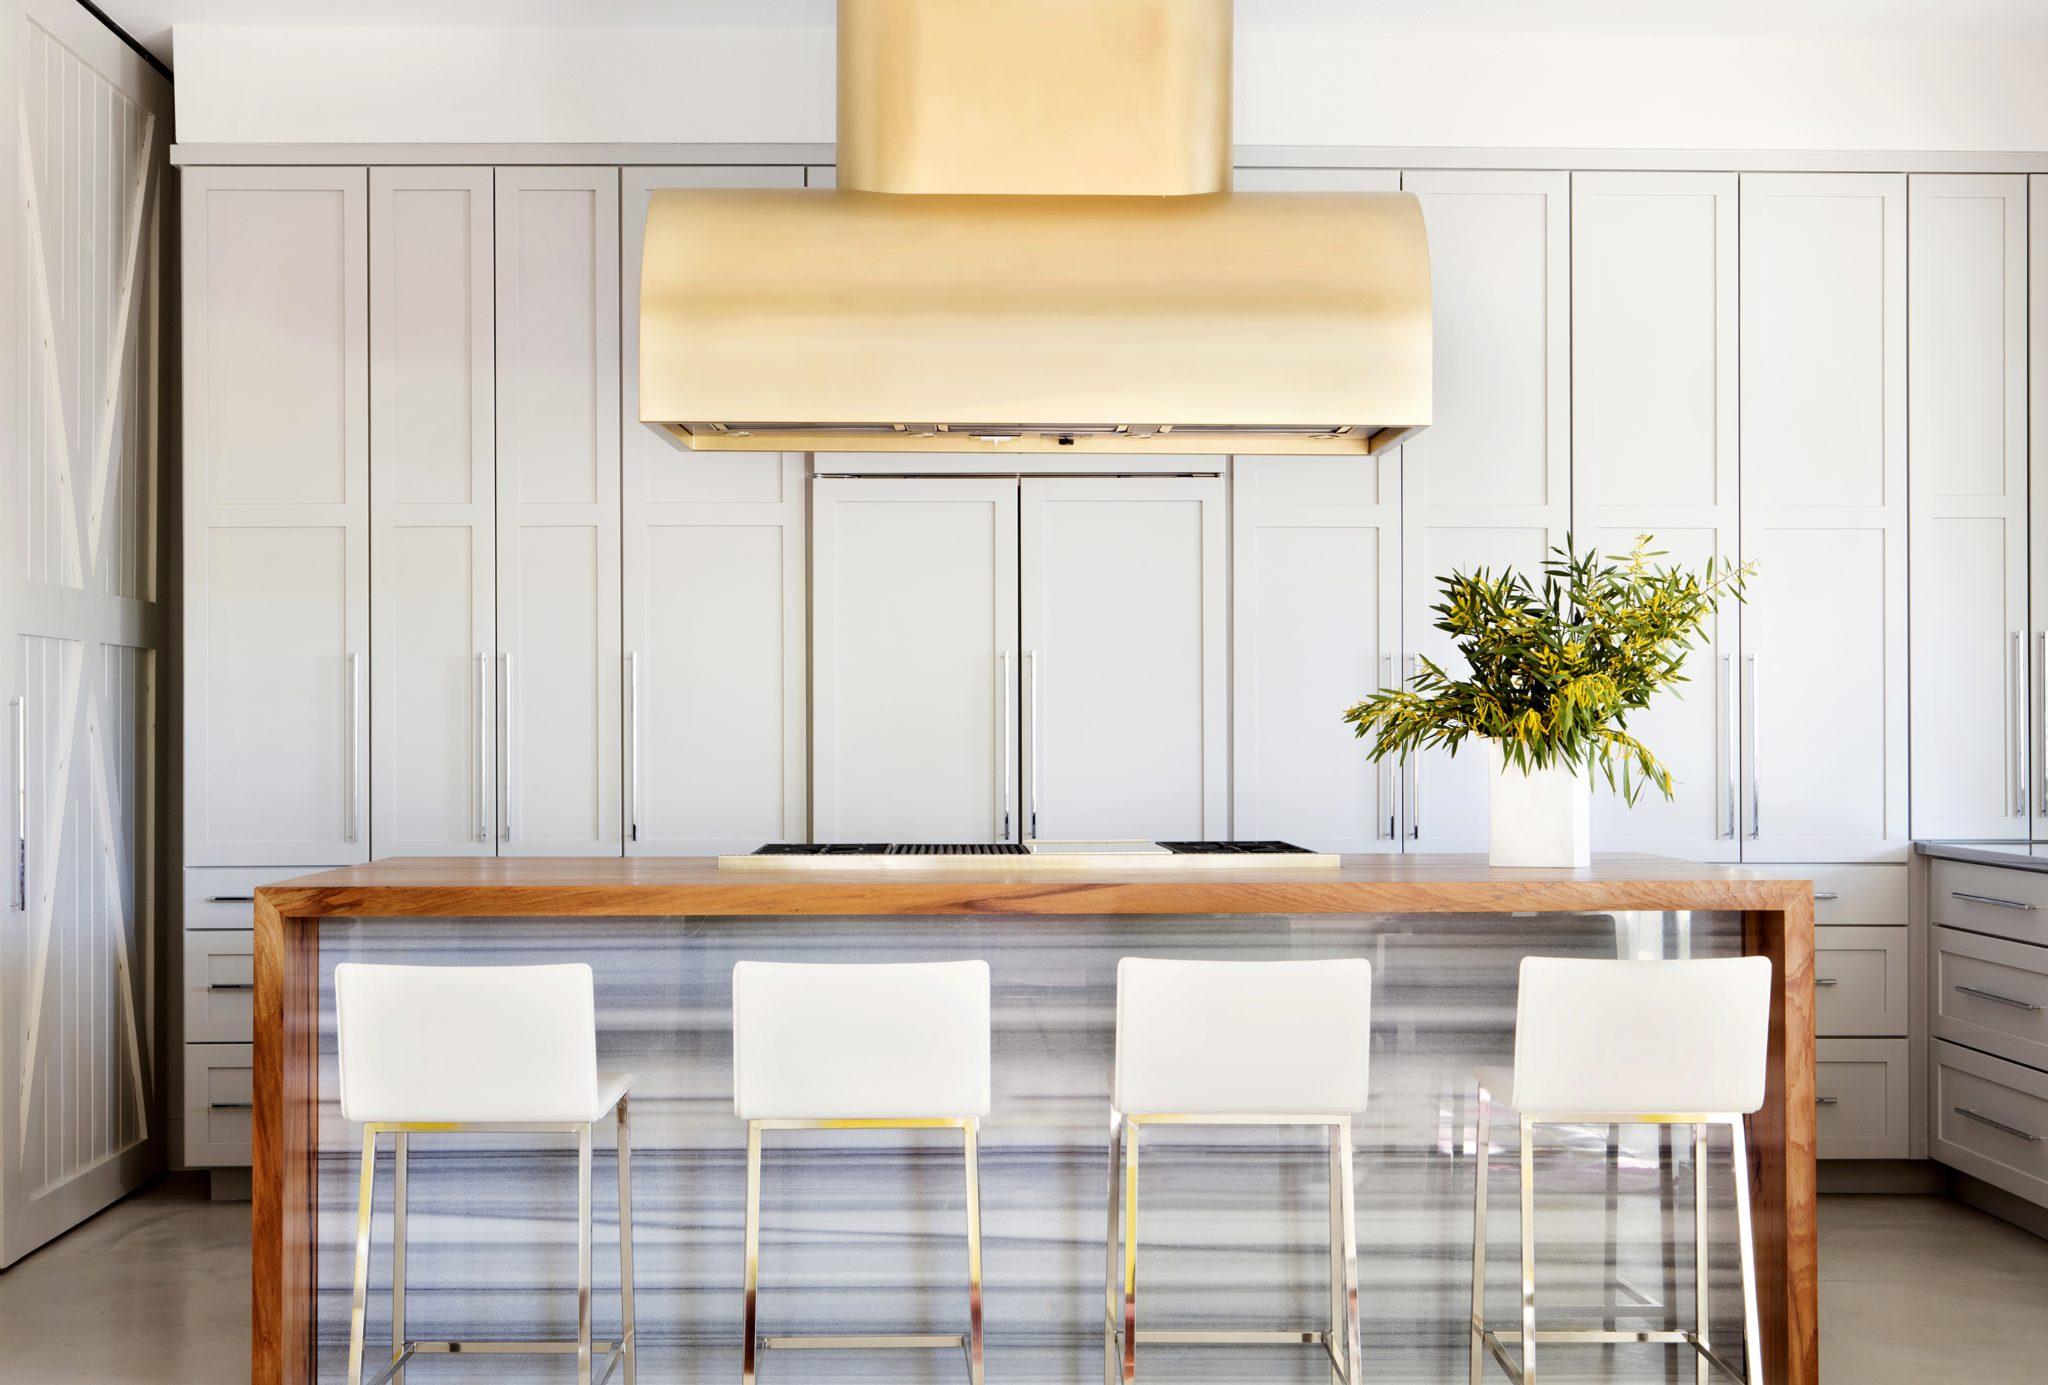 Bachelor kitchen remodel by Sarah Wittenbraker Interiors